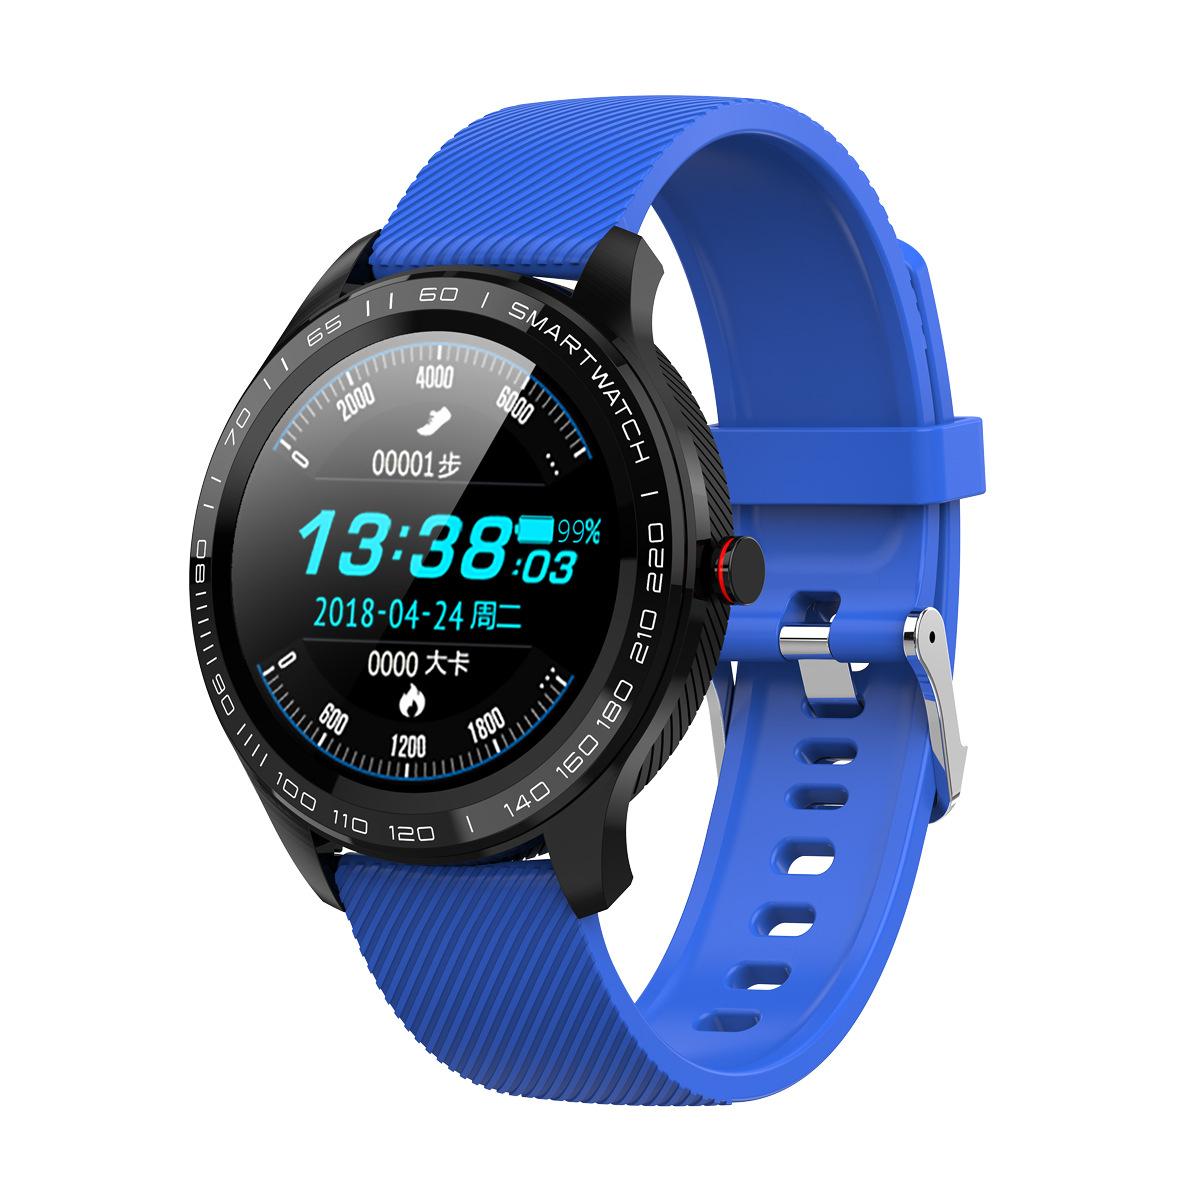 L9 Bracelet Full Round Screen Multi-Sport Heart Rate Sleep Monitoring Offline Payment Bracelet dark blue